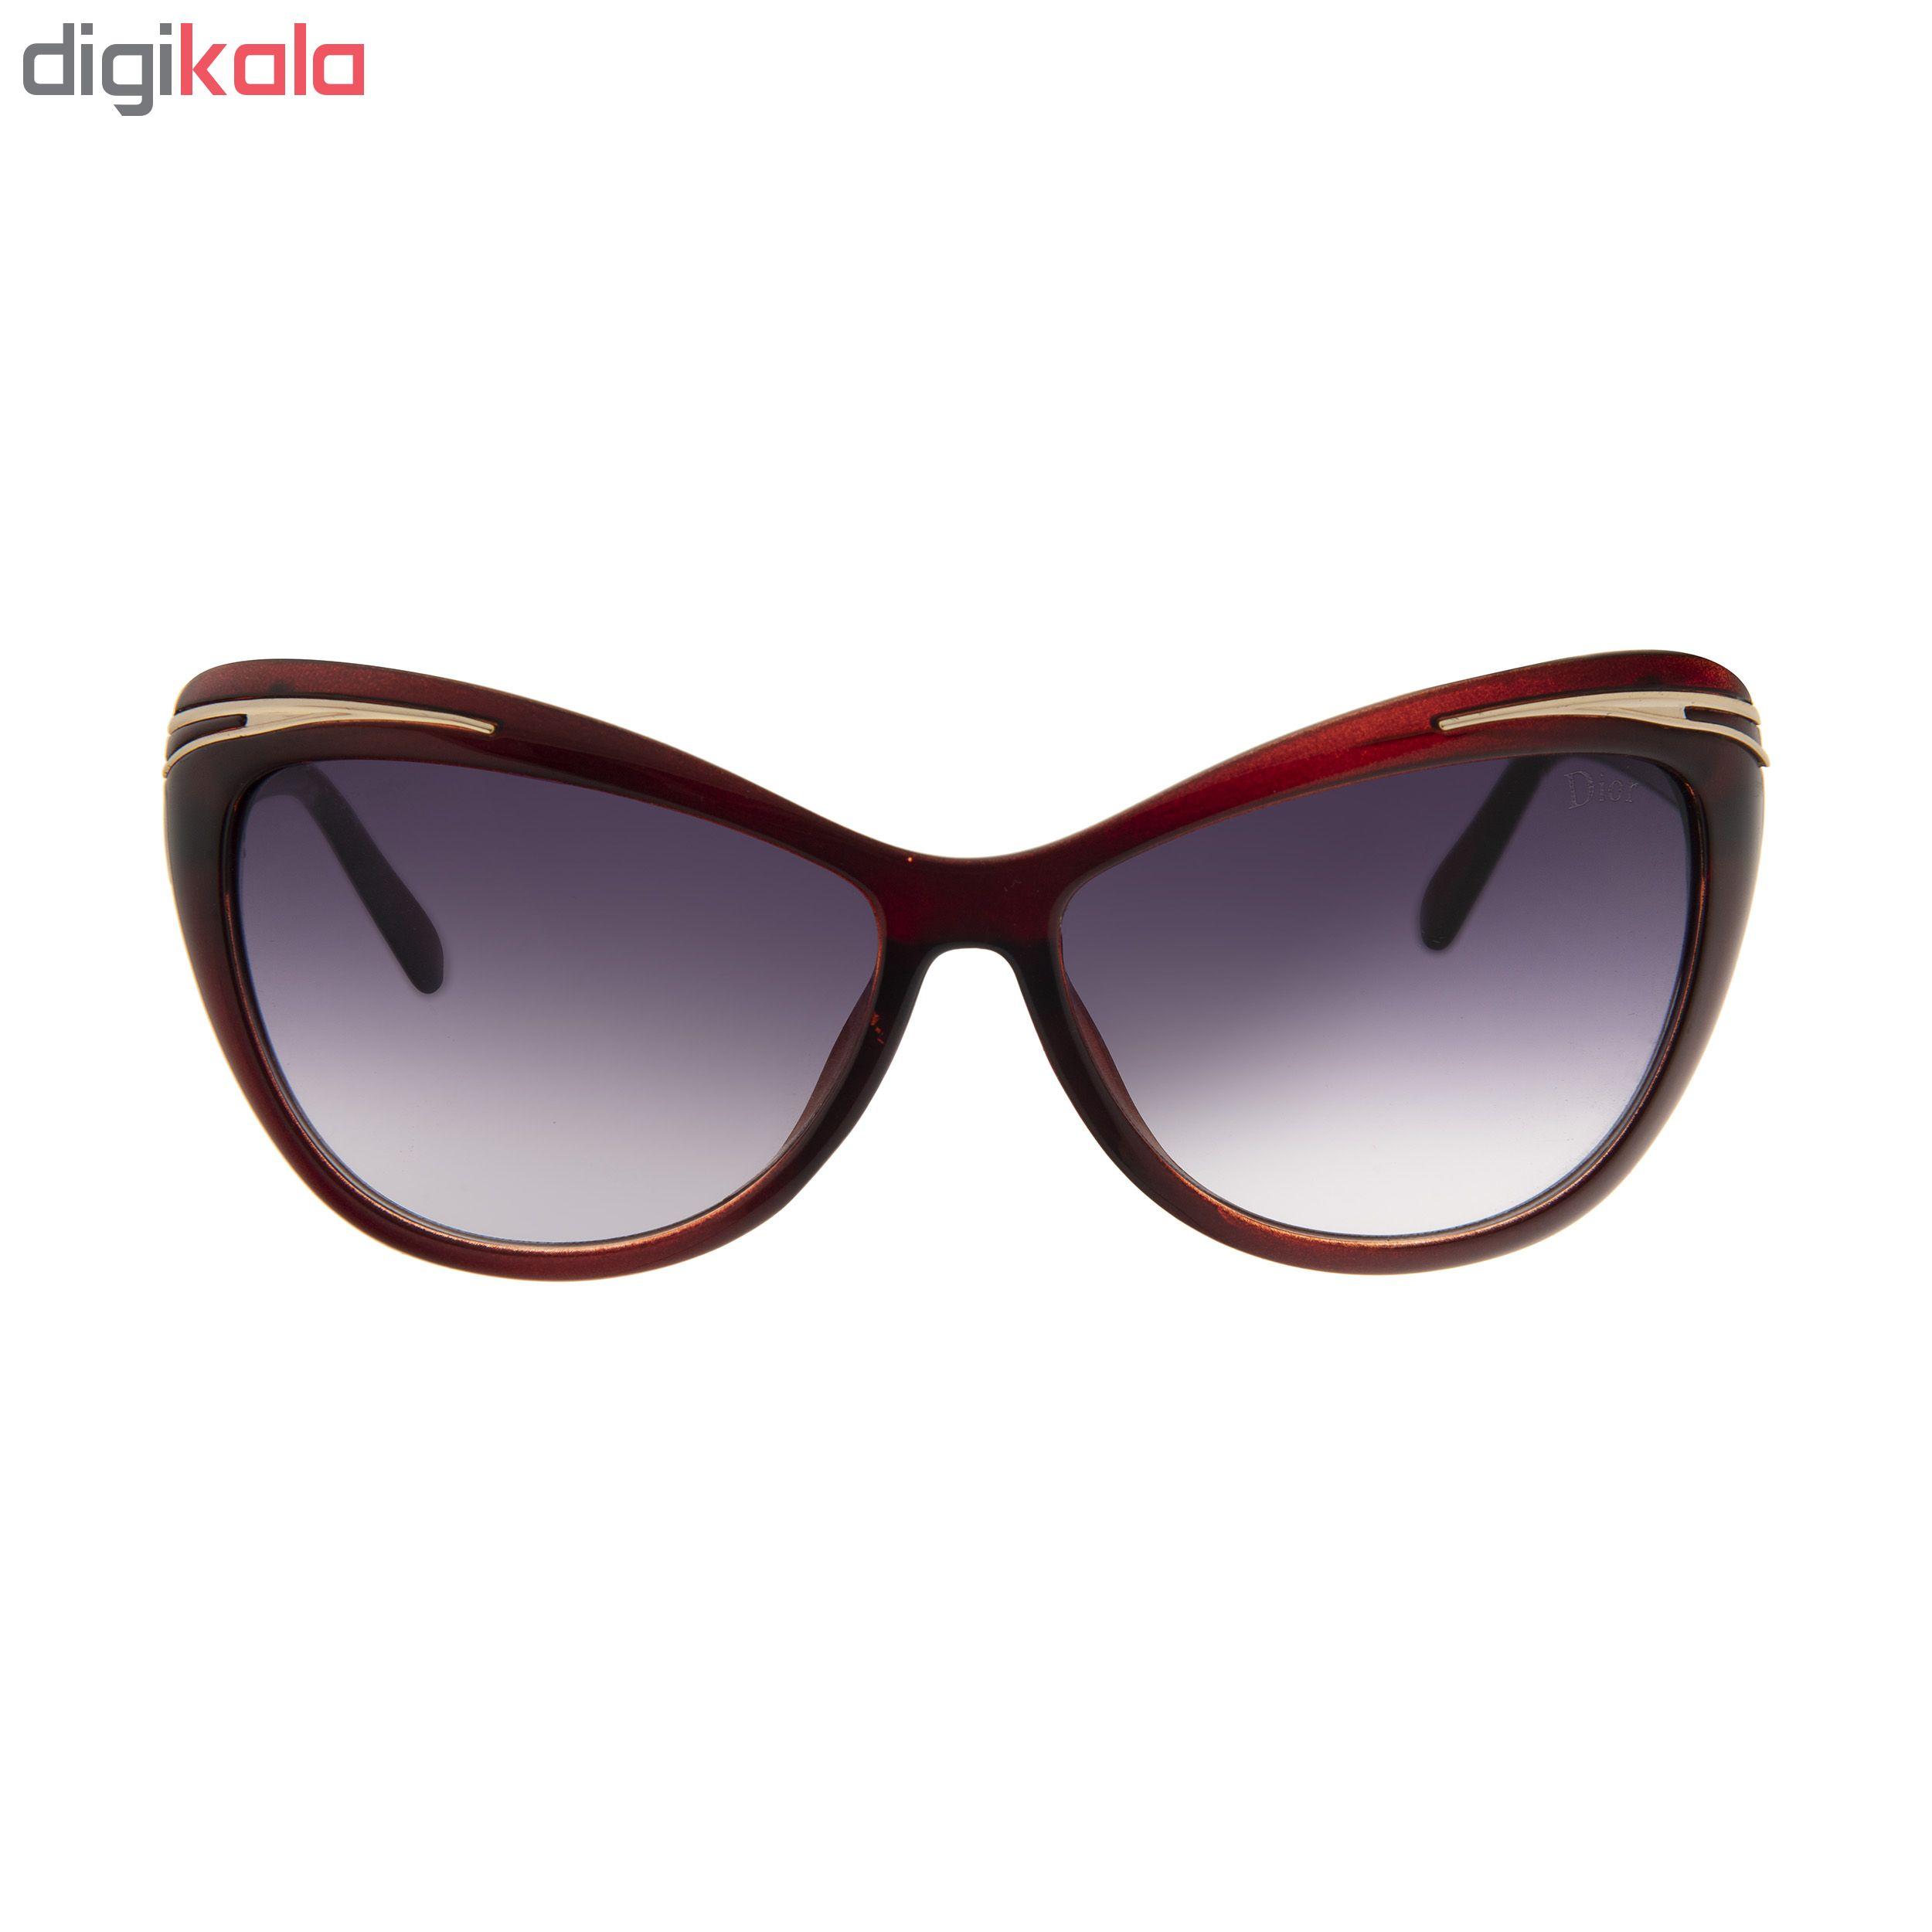 عینک آفتابی مدل Alunix B3